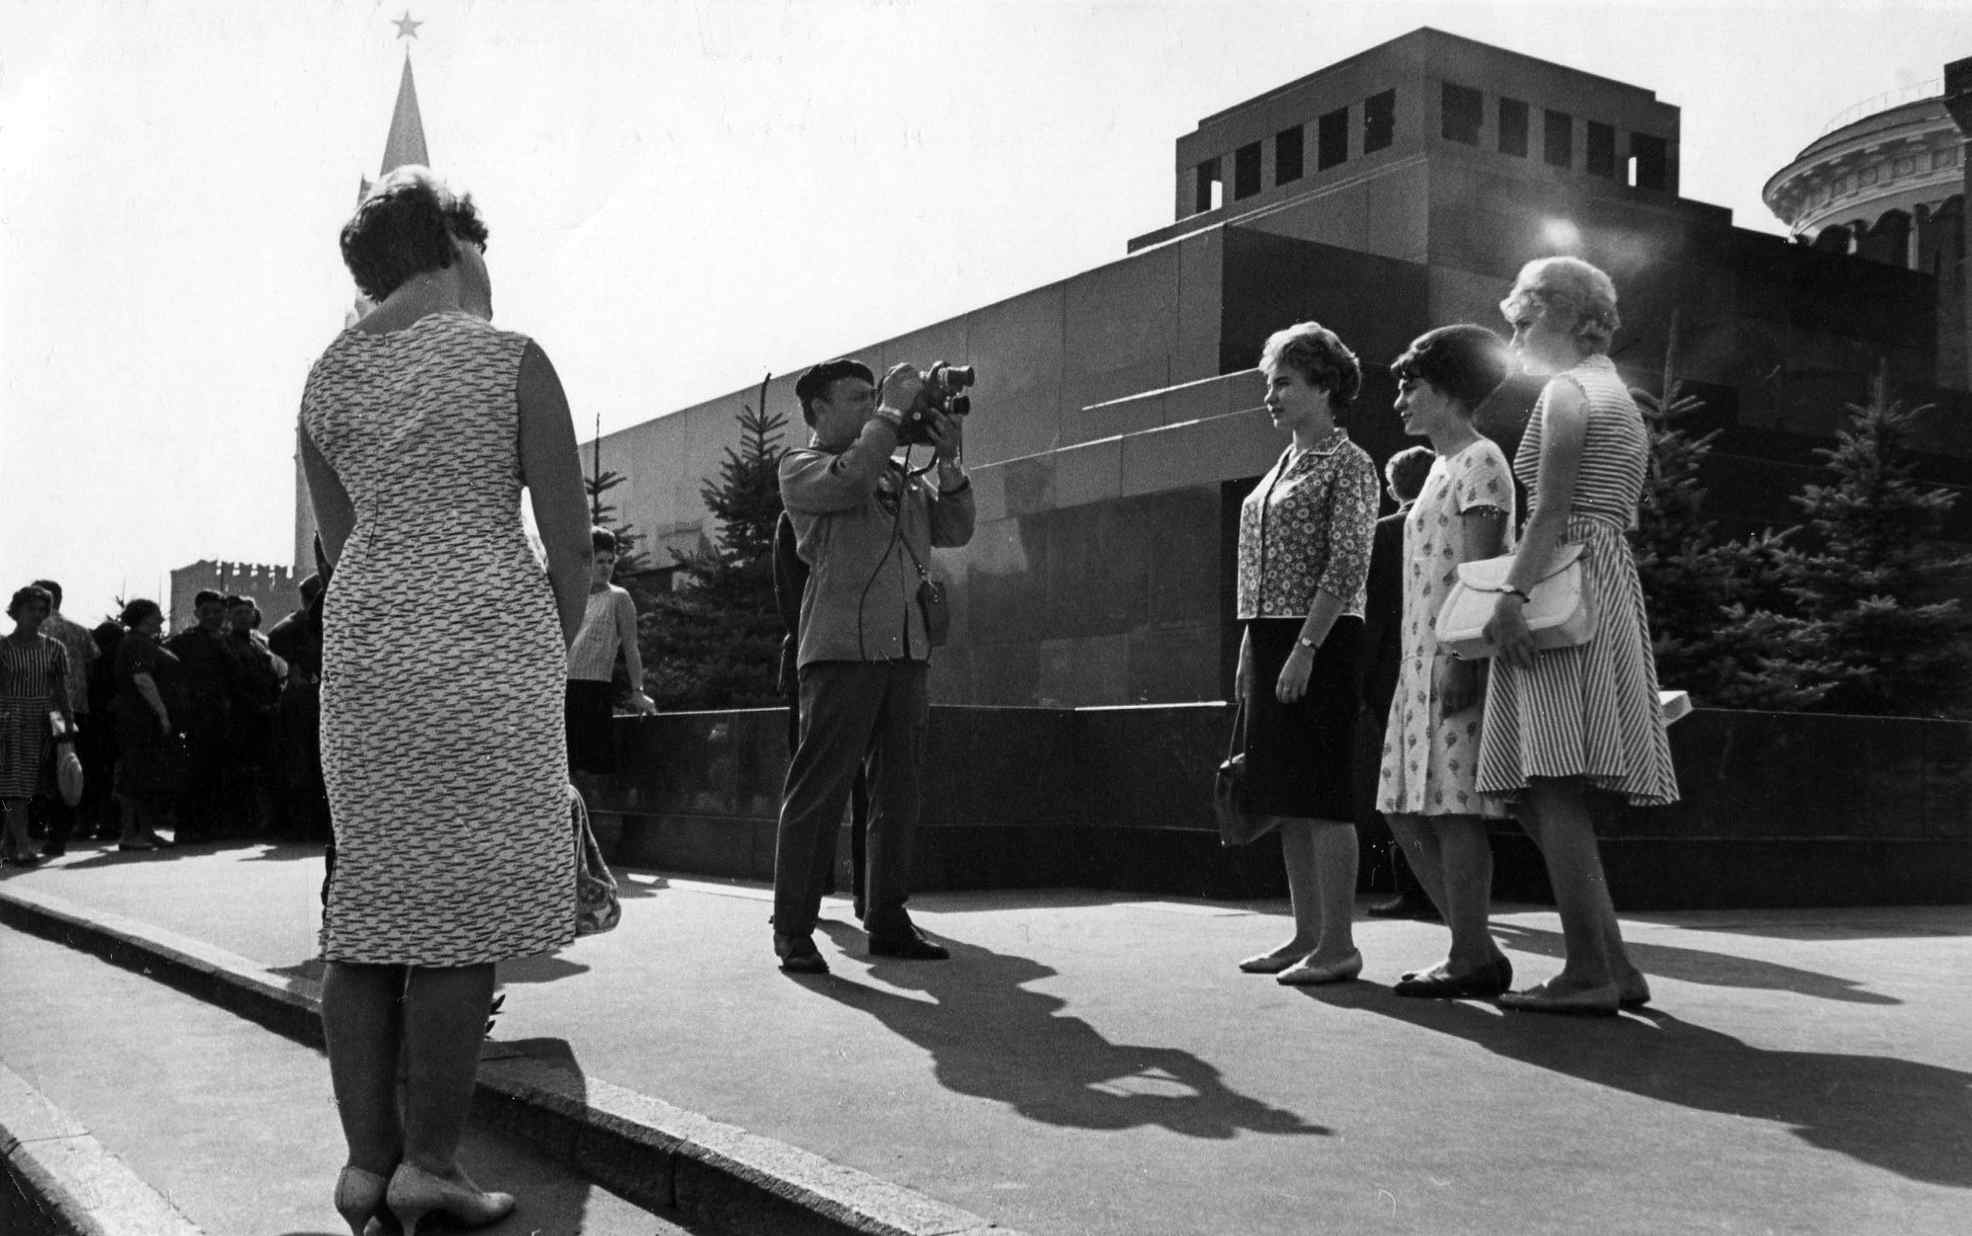 Экспонат #43. Снимает кинооператор Леонид Котляренко. 1964 год.